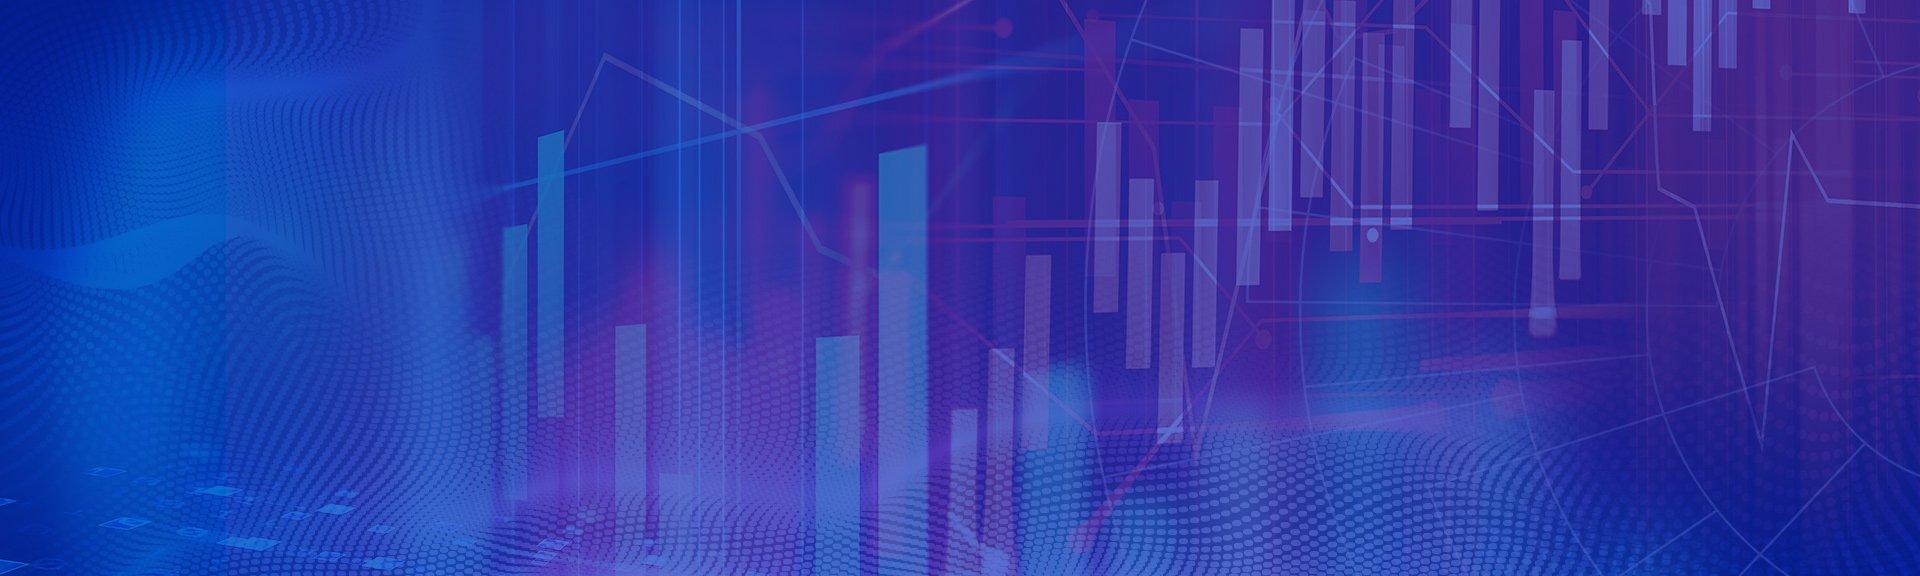 Measurement-&-Analytics-3-Low-Res_blue